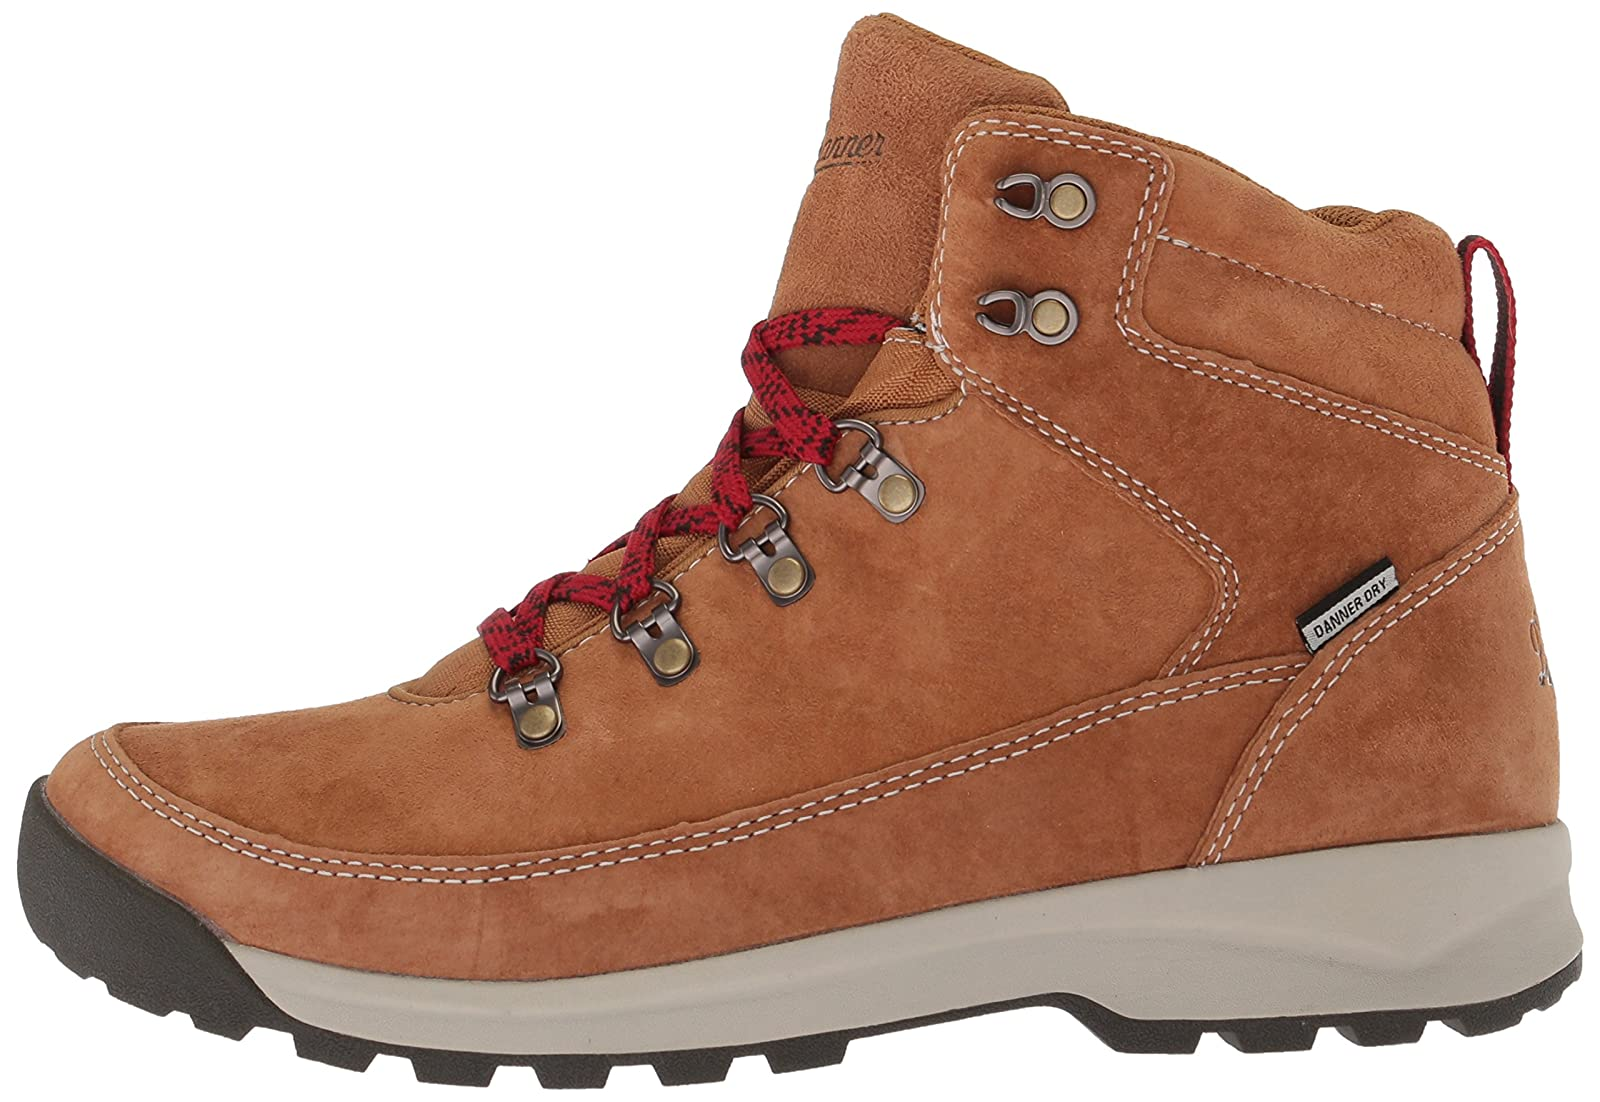 Danner Women's Adrika Hiker Hiking Boot 2 M US Boy - 5